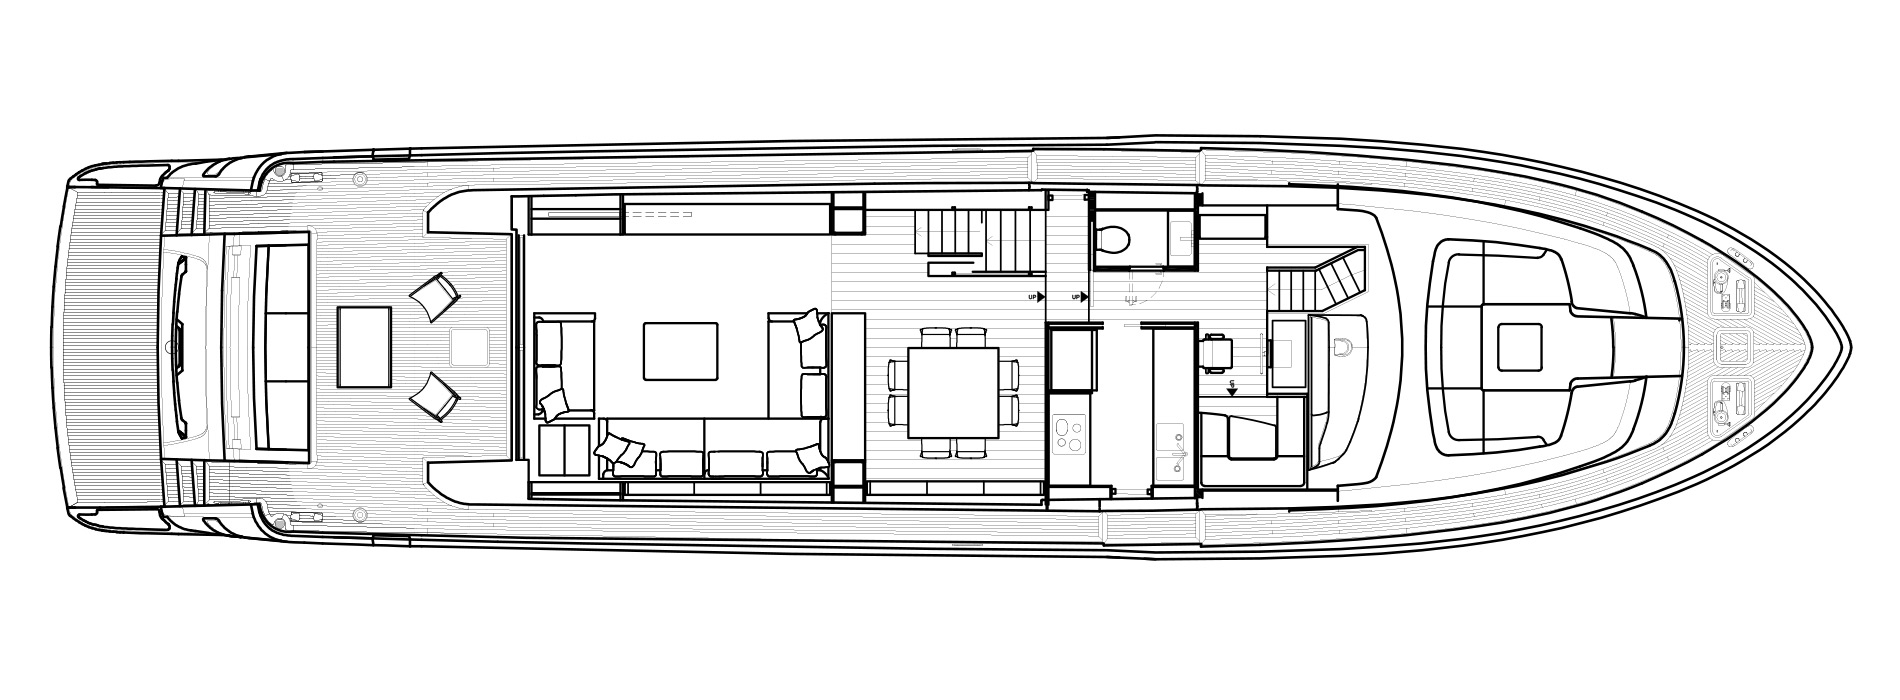 Sanlorenzo Yachts SL86 Главная палуба версия A